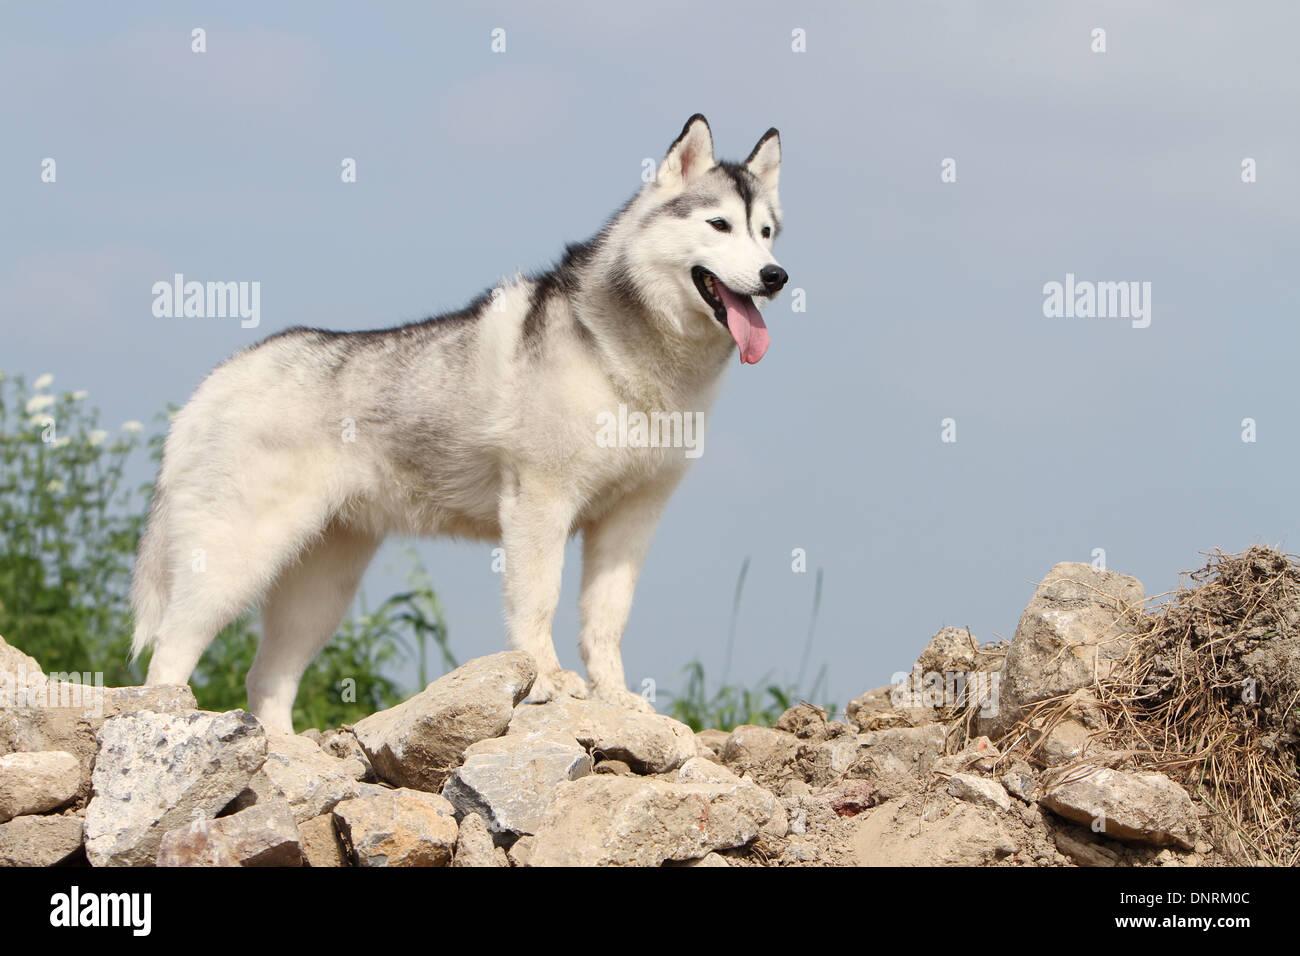 dog siberian husky adult standing on rocks stock photo